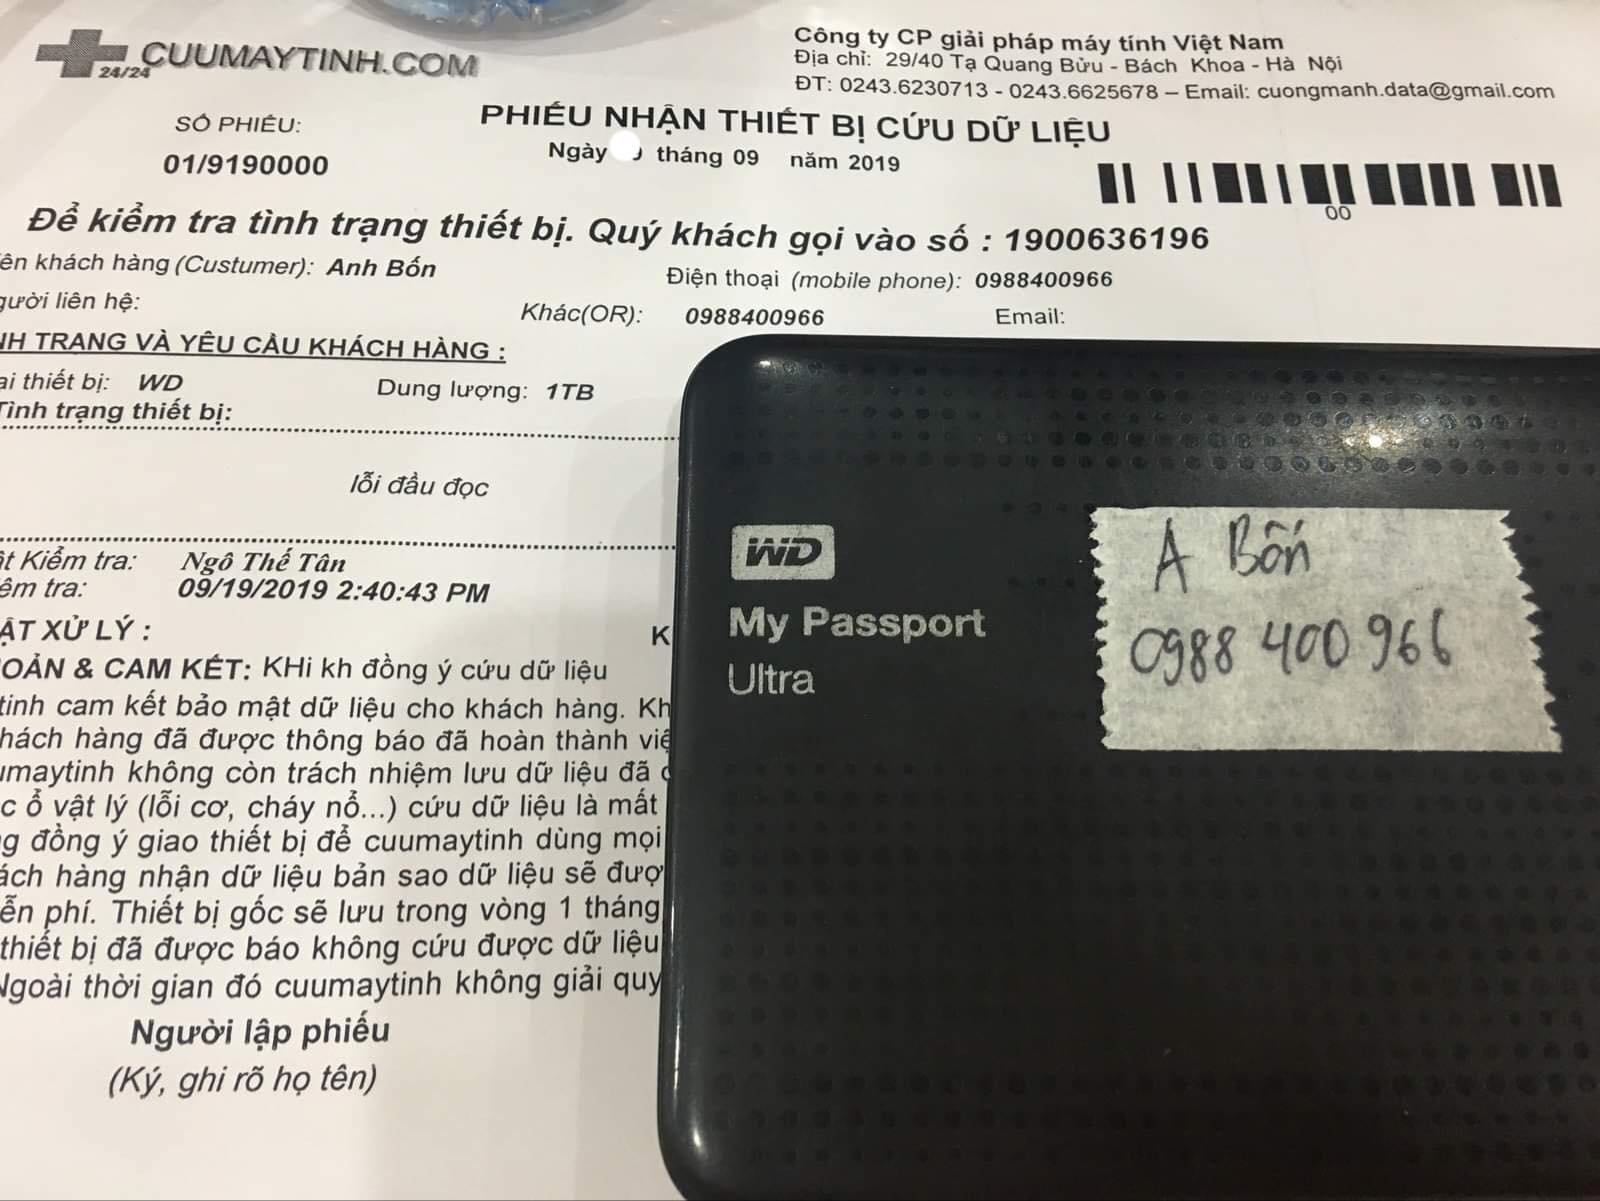 Lấy dữ liệu ổ cứng Western 1TB lỗi đầu đọc 23/09/2019  - cuumaytinh